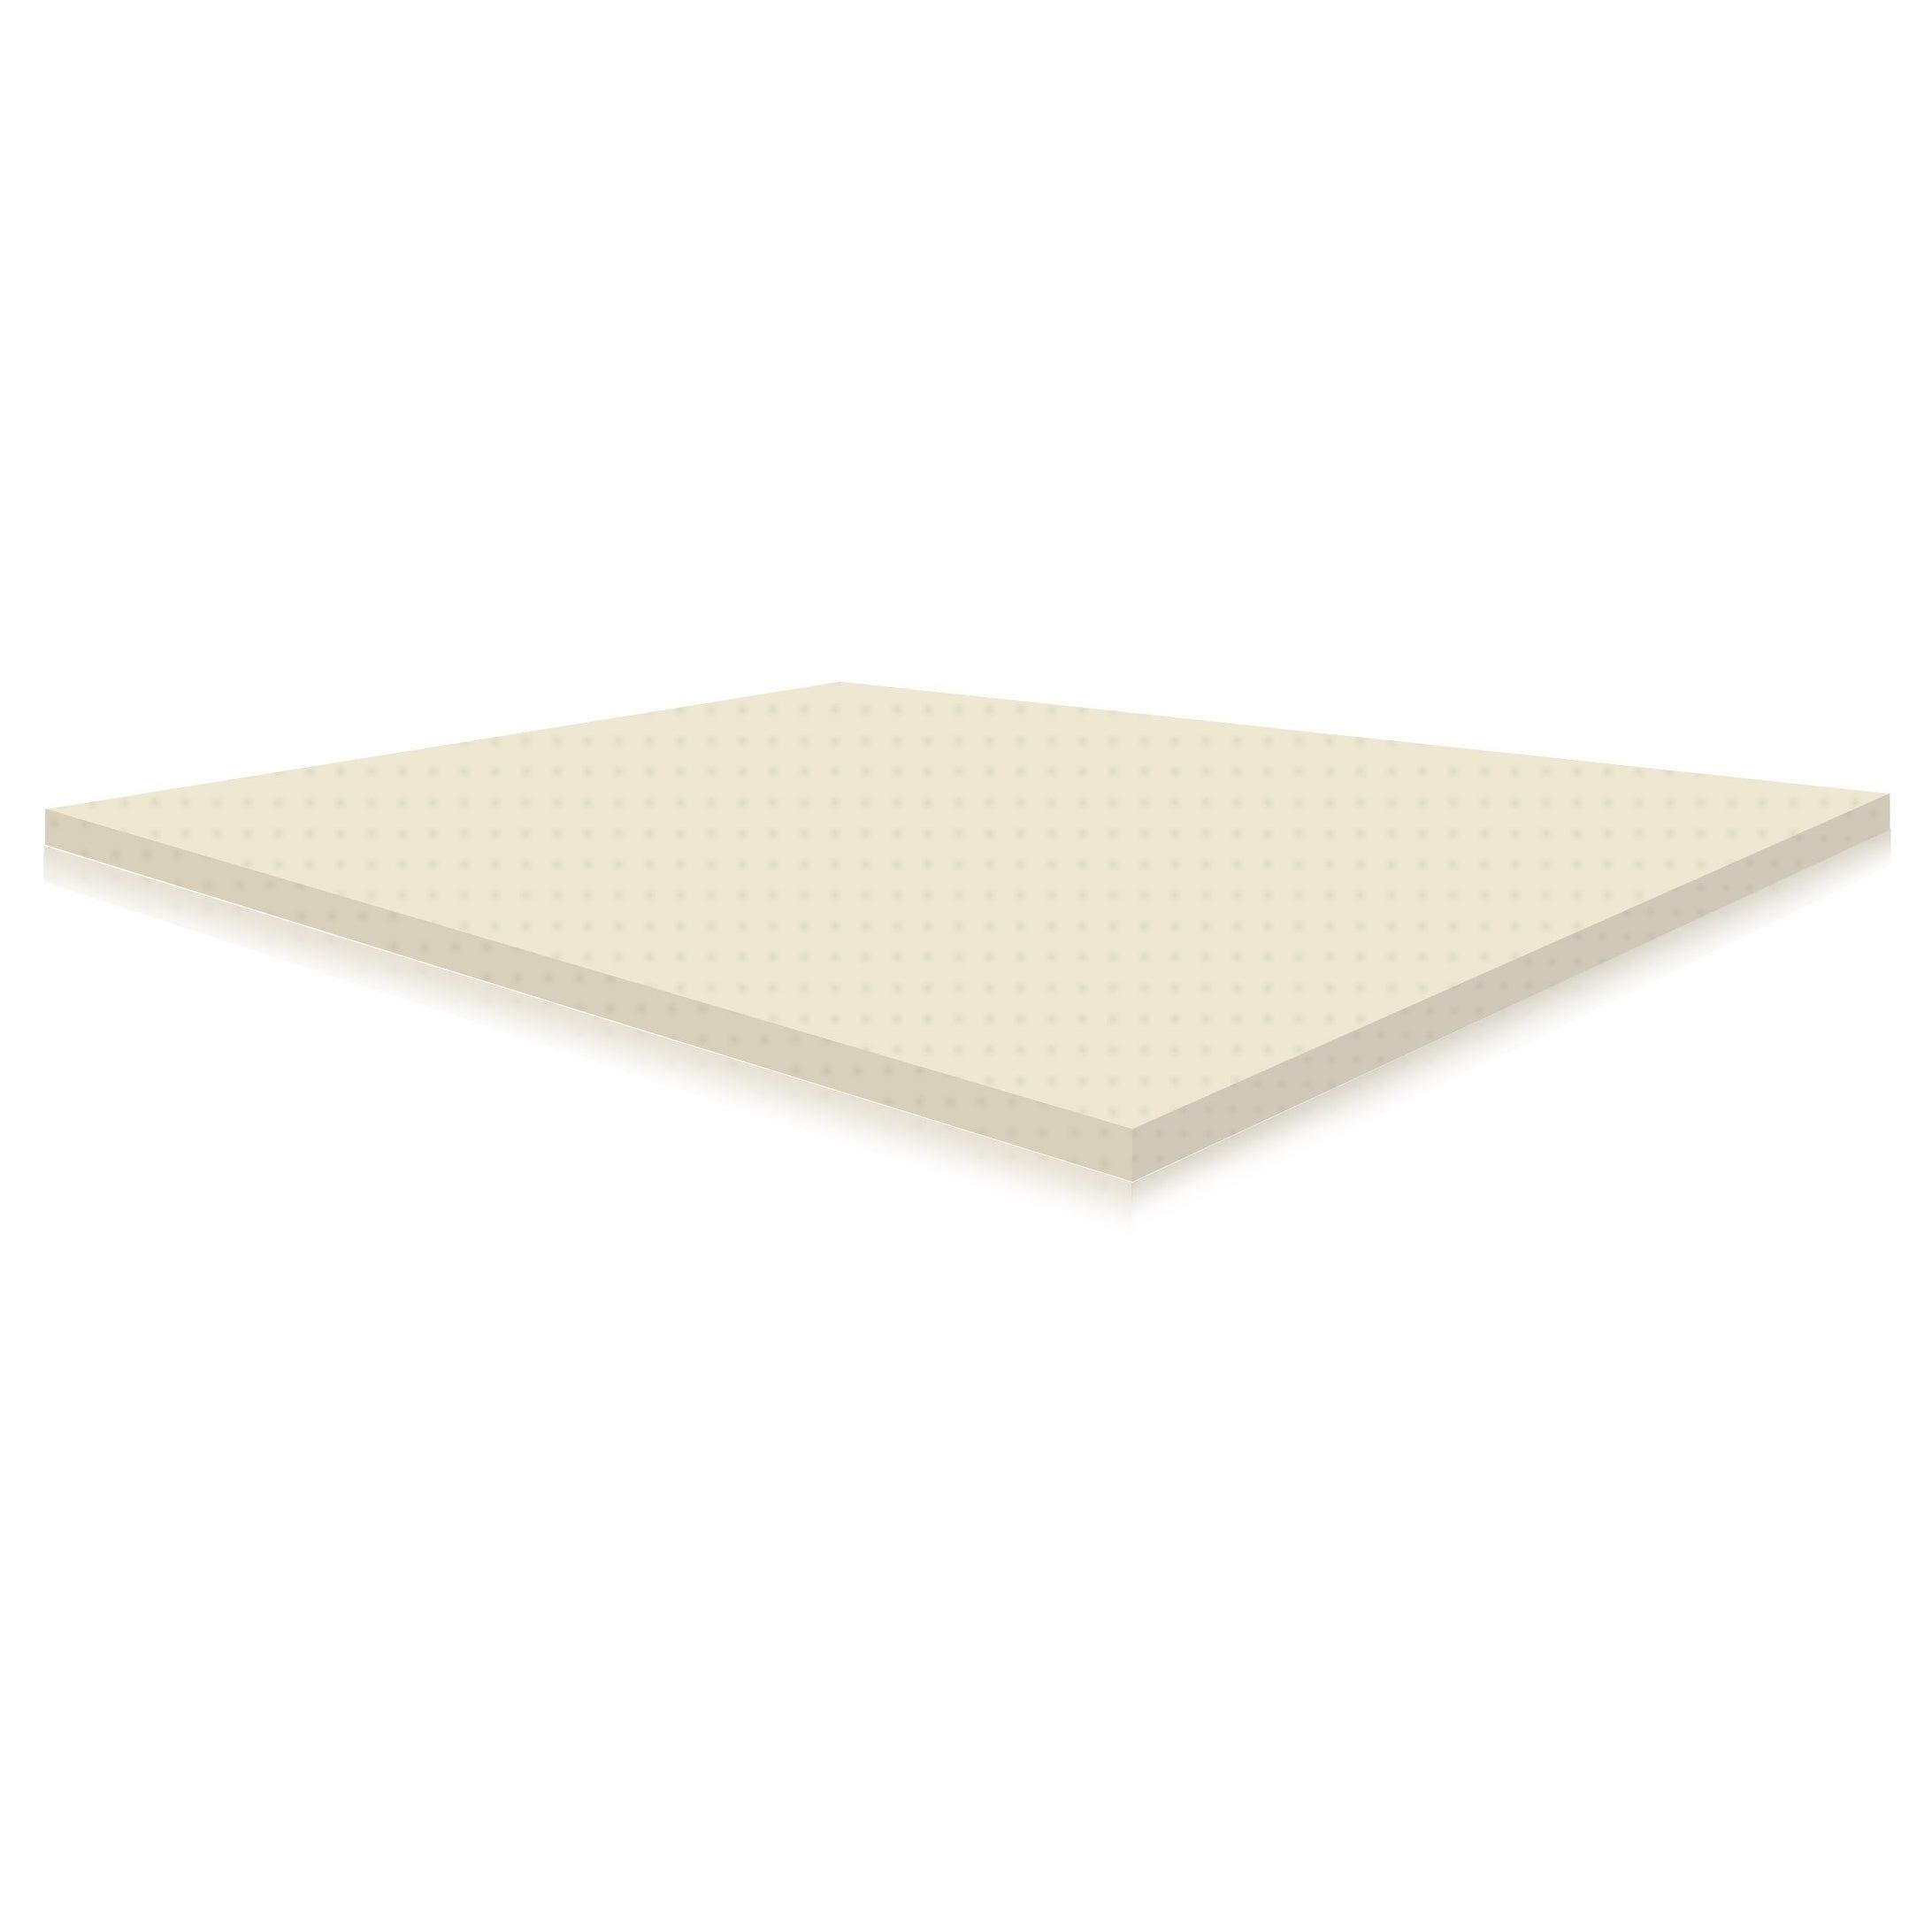 1 Inch High Density Foam Topper Adds Comfort To Mattress In 2020